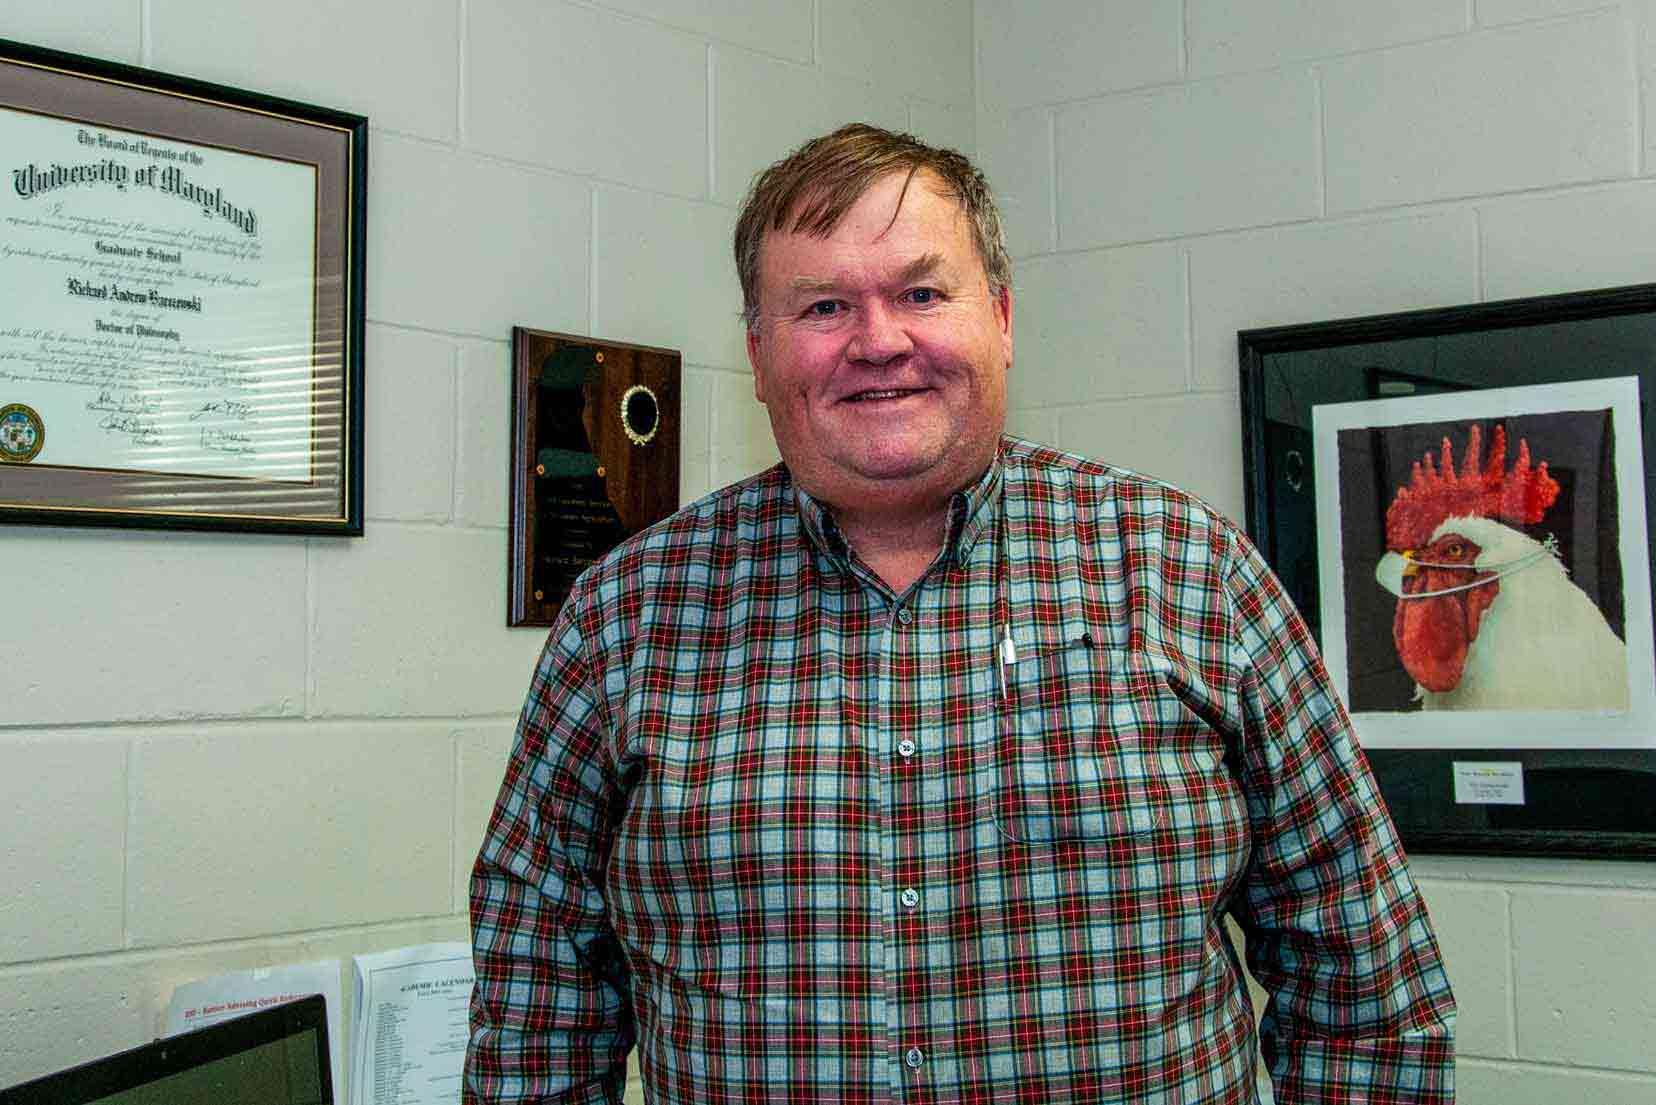 Dr. Richard Barczewski named Professor Emeritus